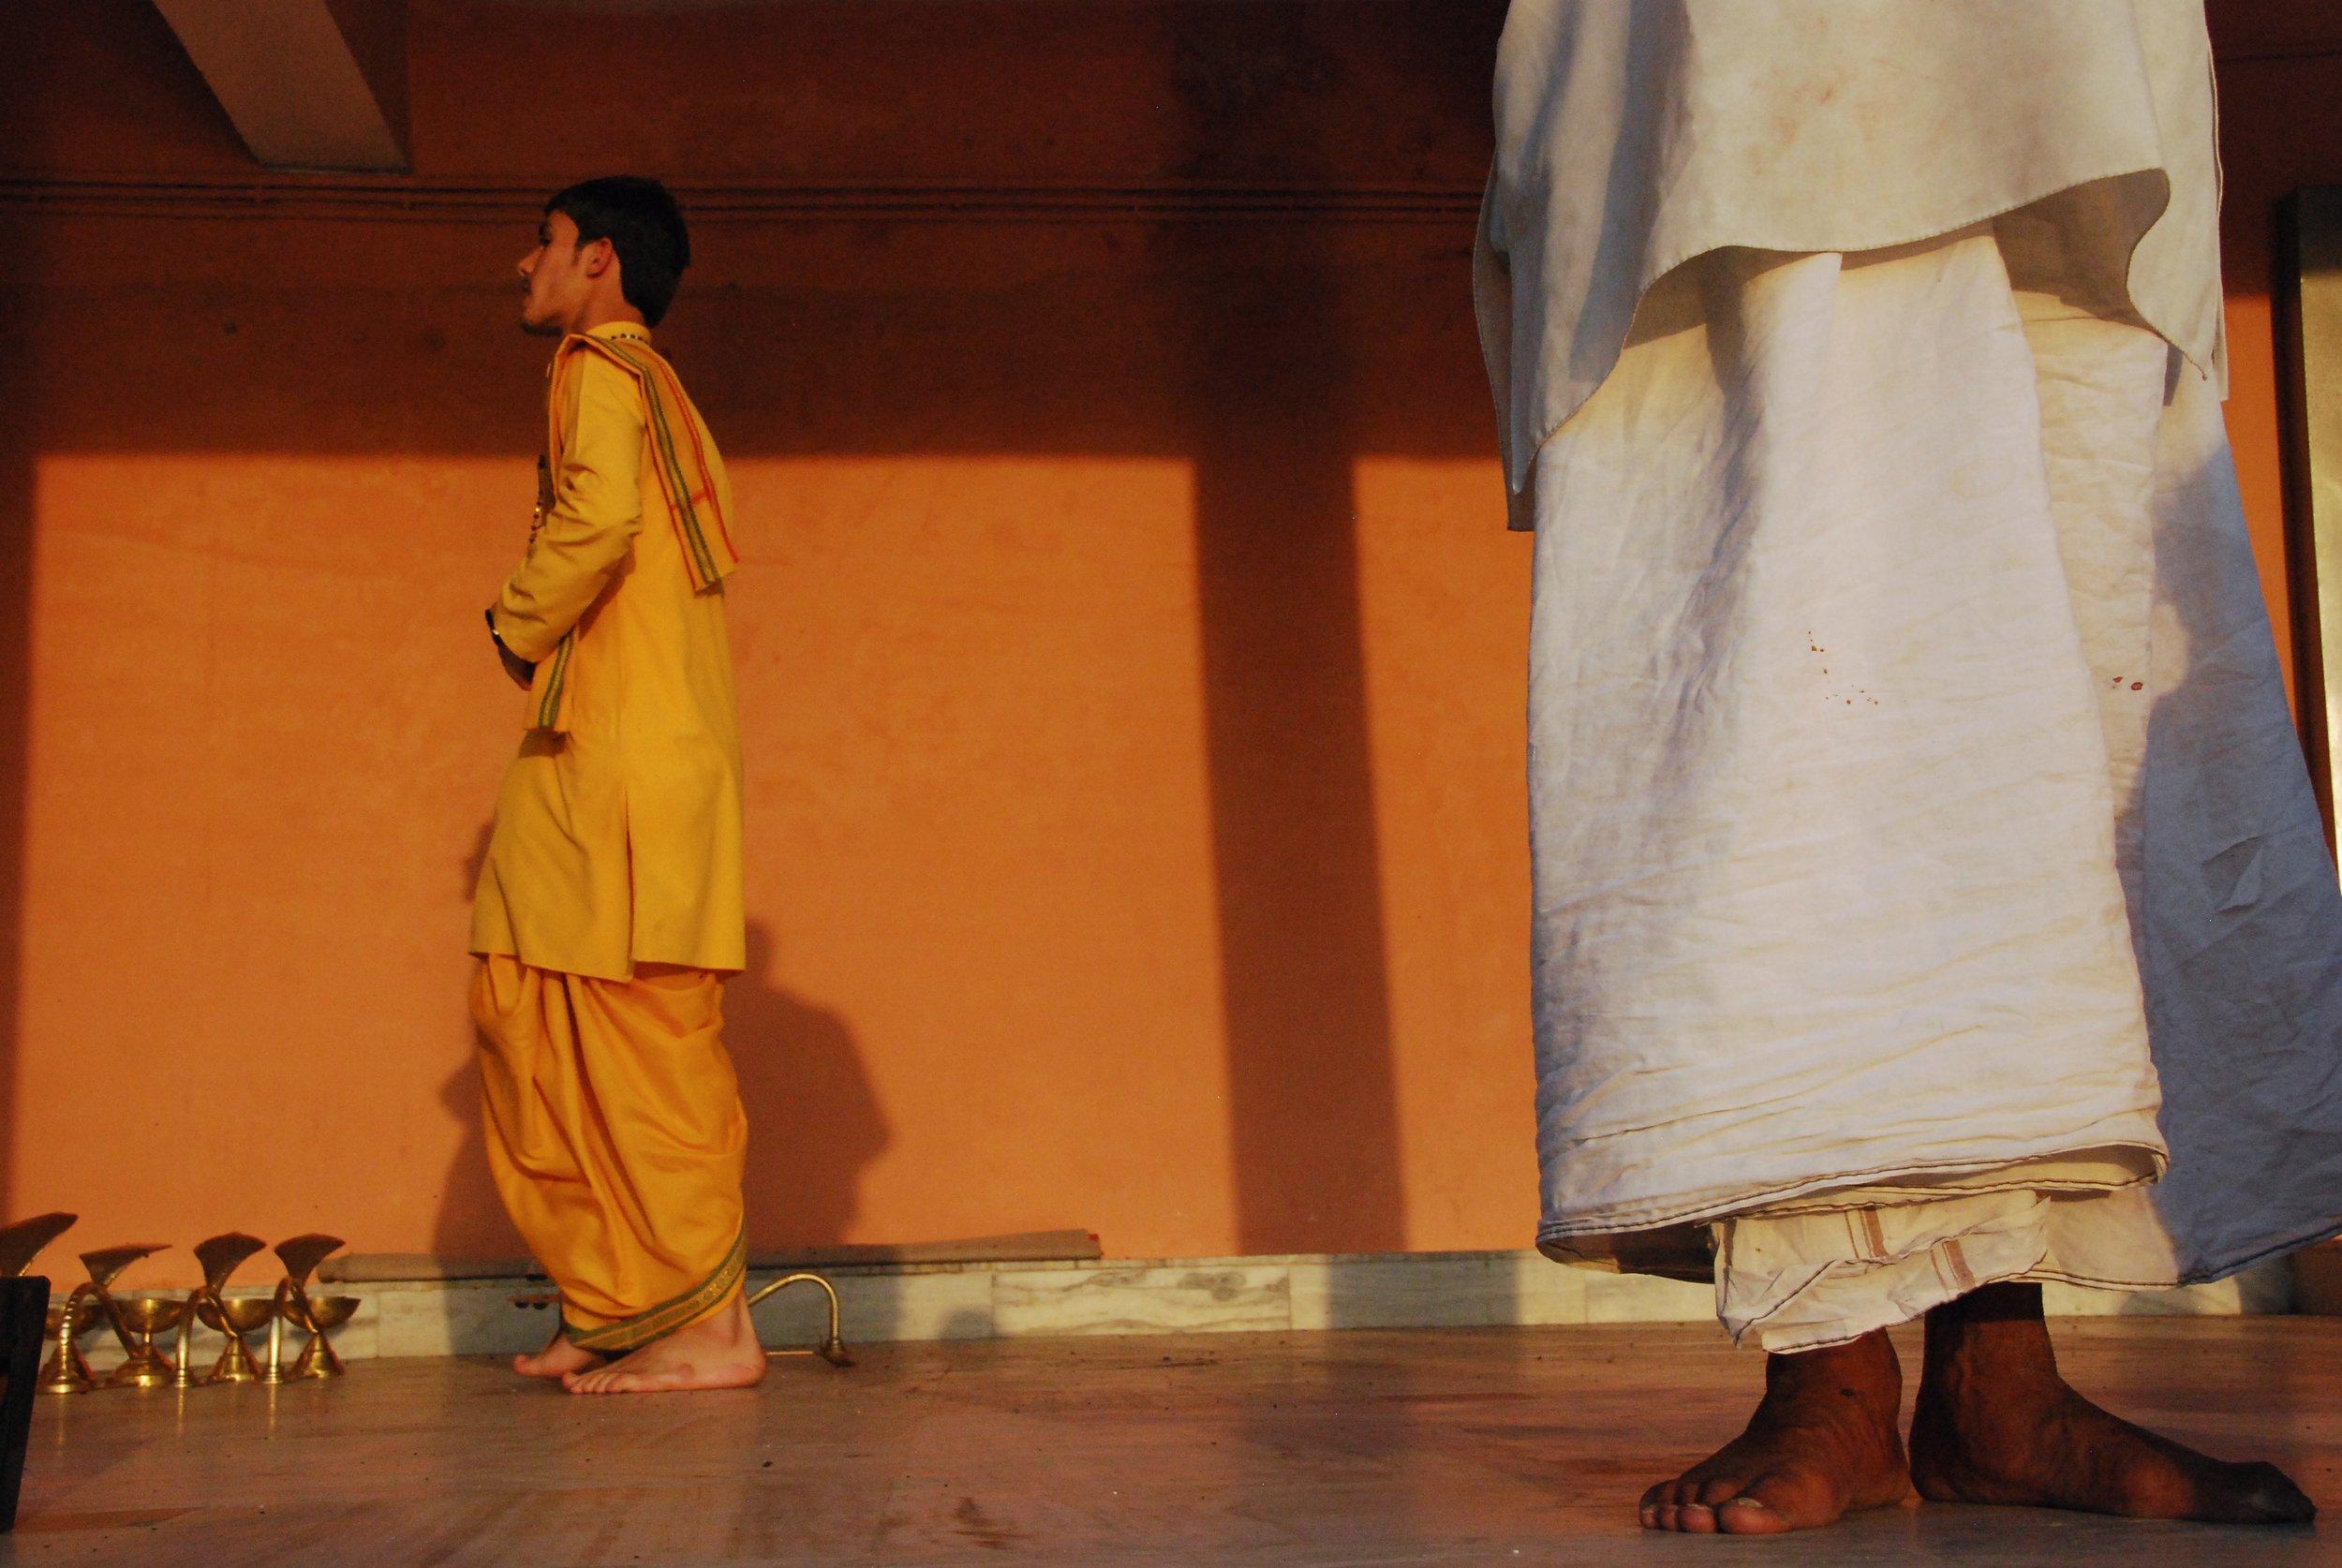 5.Lefteris_Parasyris_India_Coexist_2012_ 5.jpg